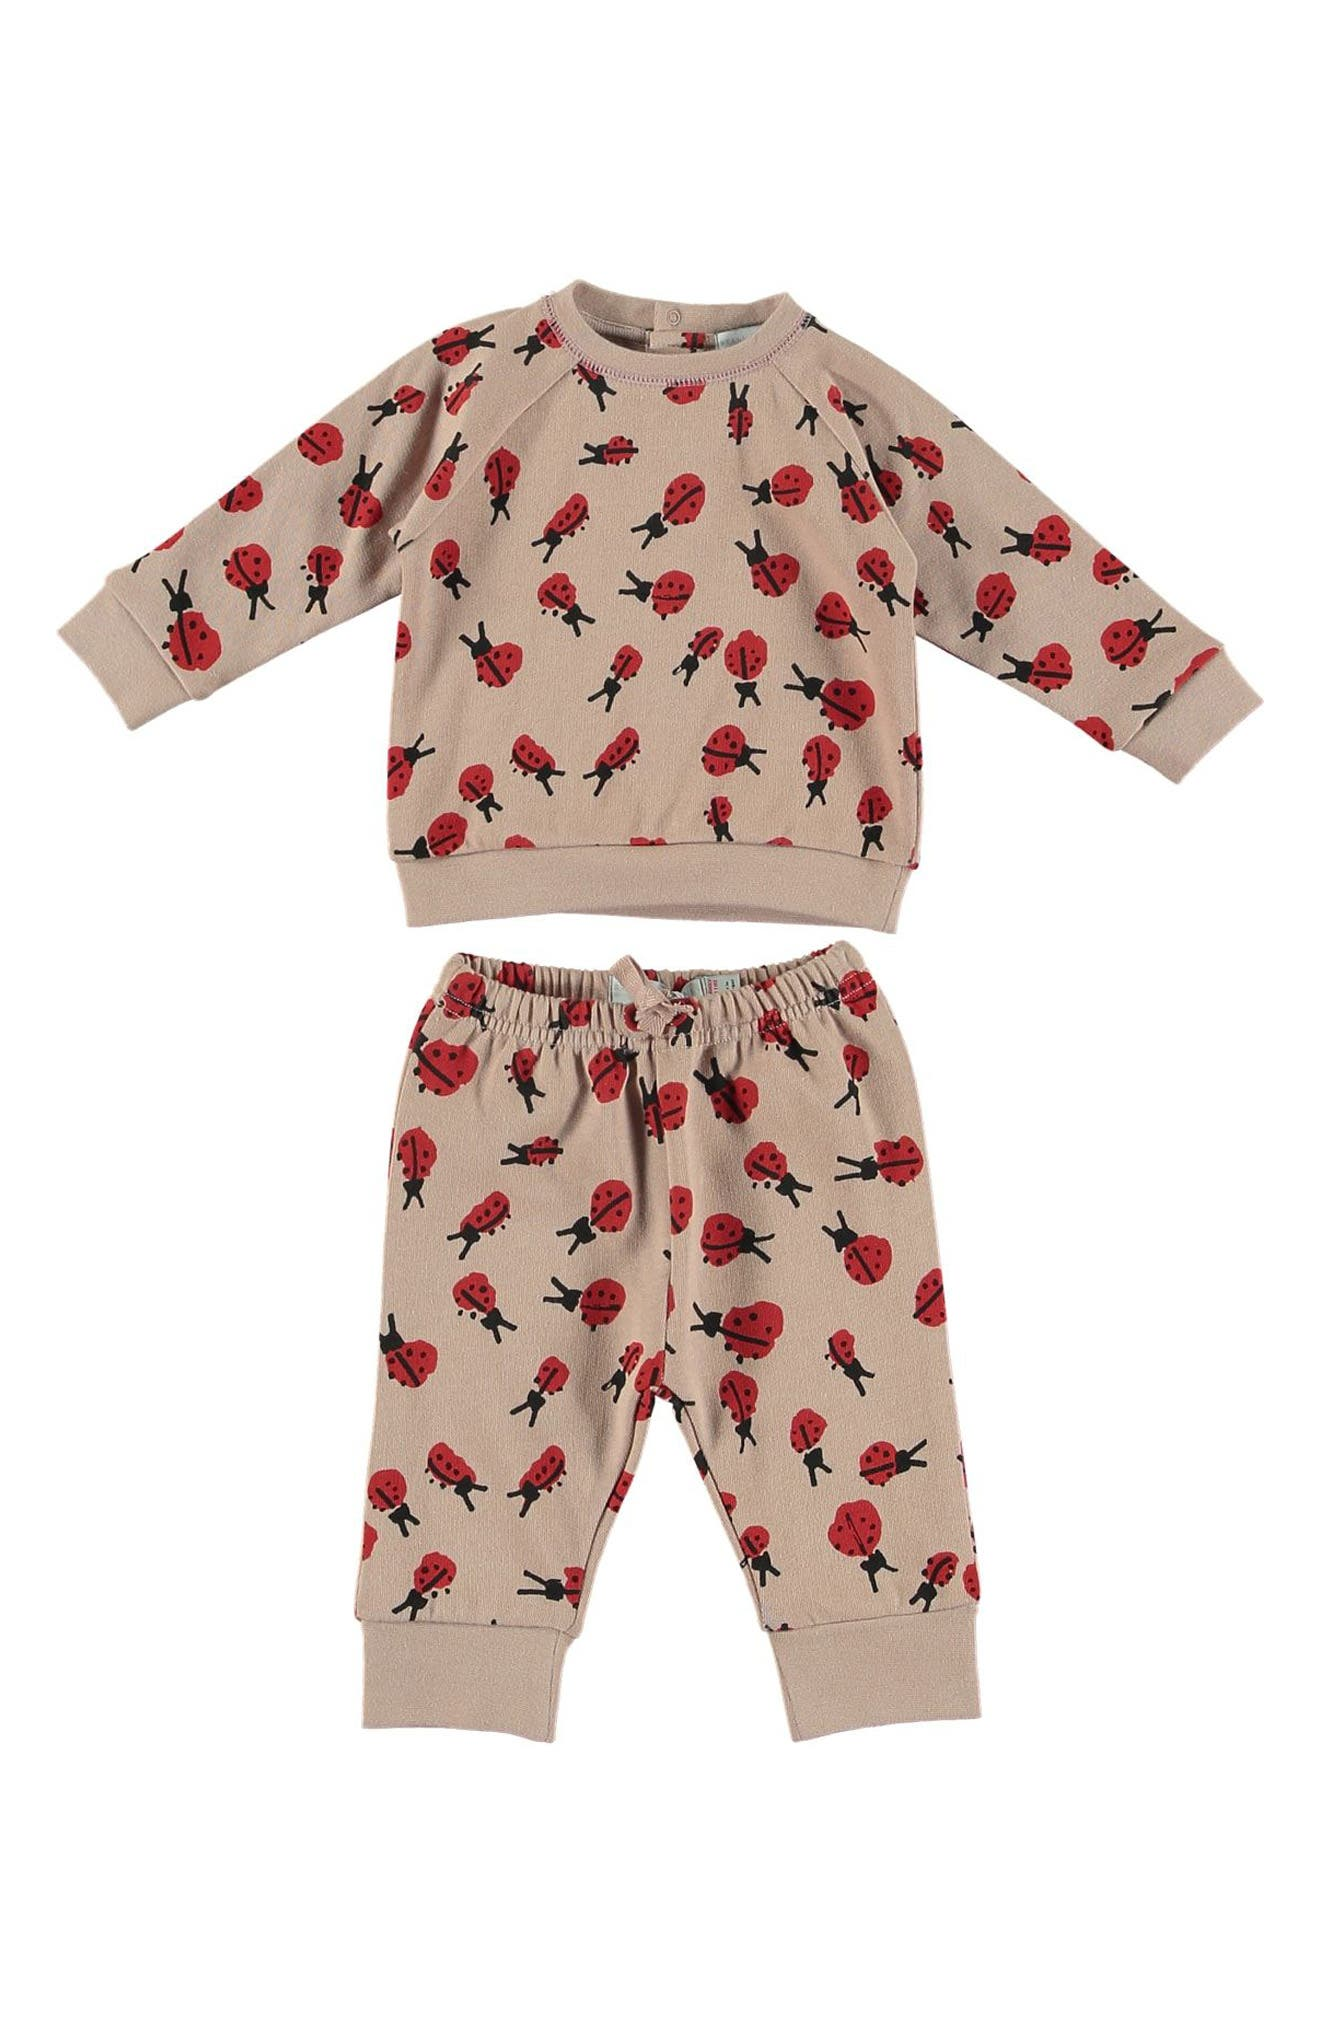 STELLA MCCARTNEY KIDS,                             Betty Ladybug Sweatshirt & Jogger Pants,                             Main thumbnail 1, color,                             650